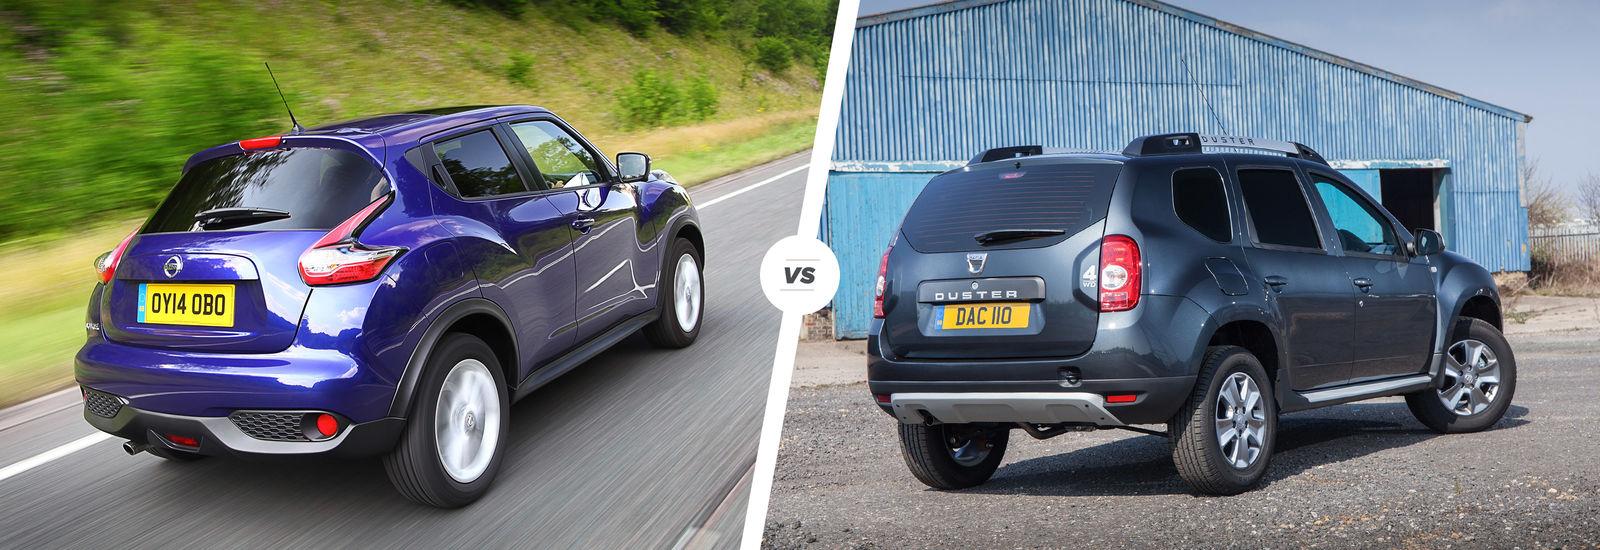 Nissan Juke vs Dacia Duster  budget SUV battle  carwow